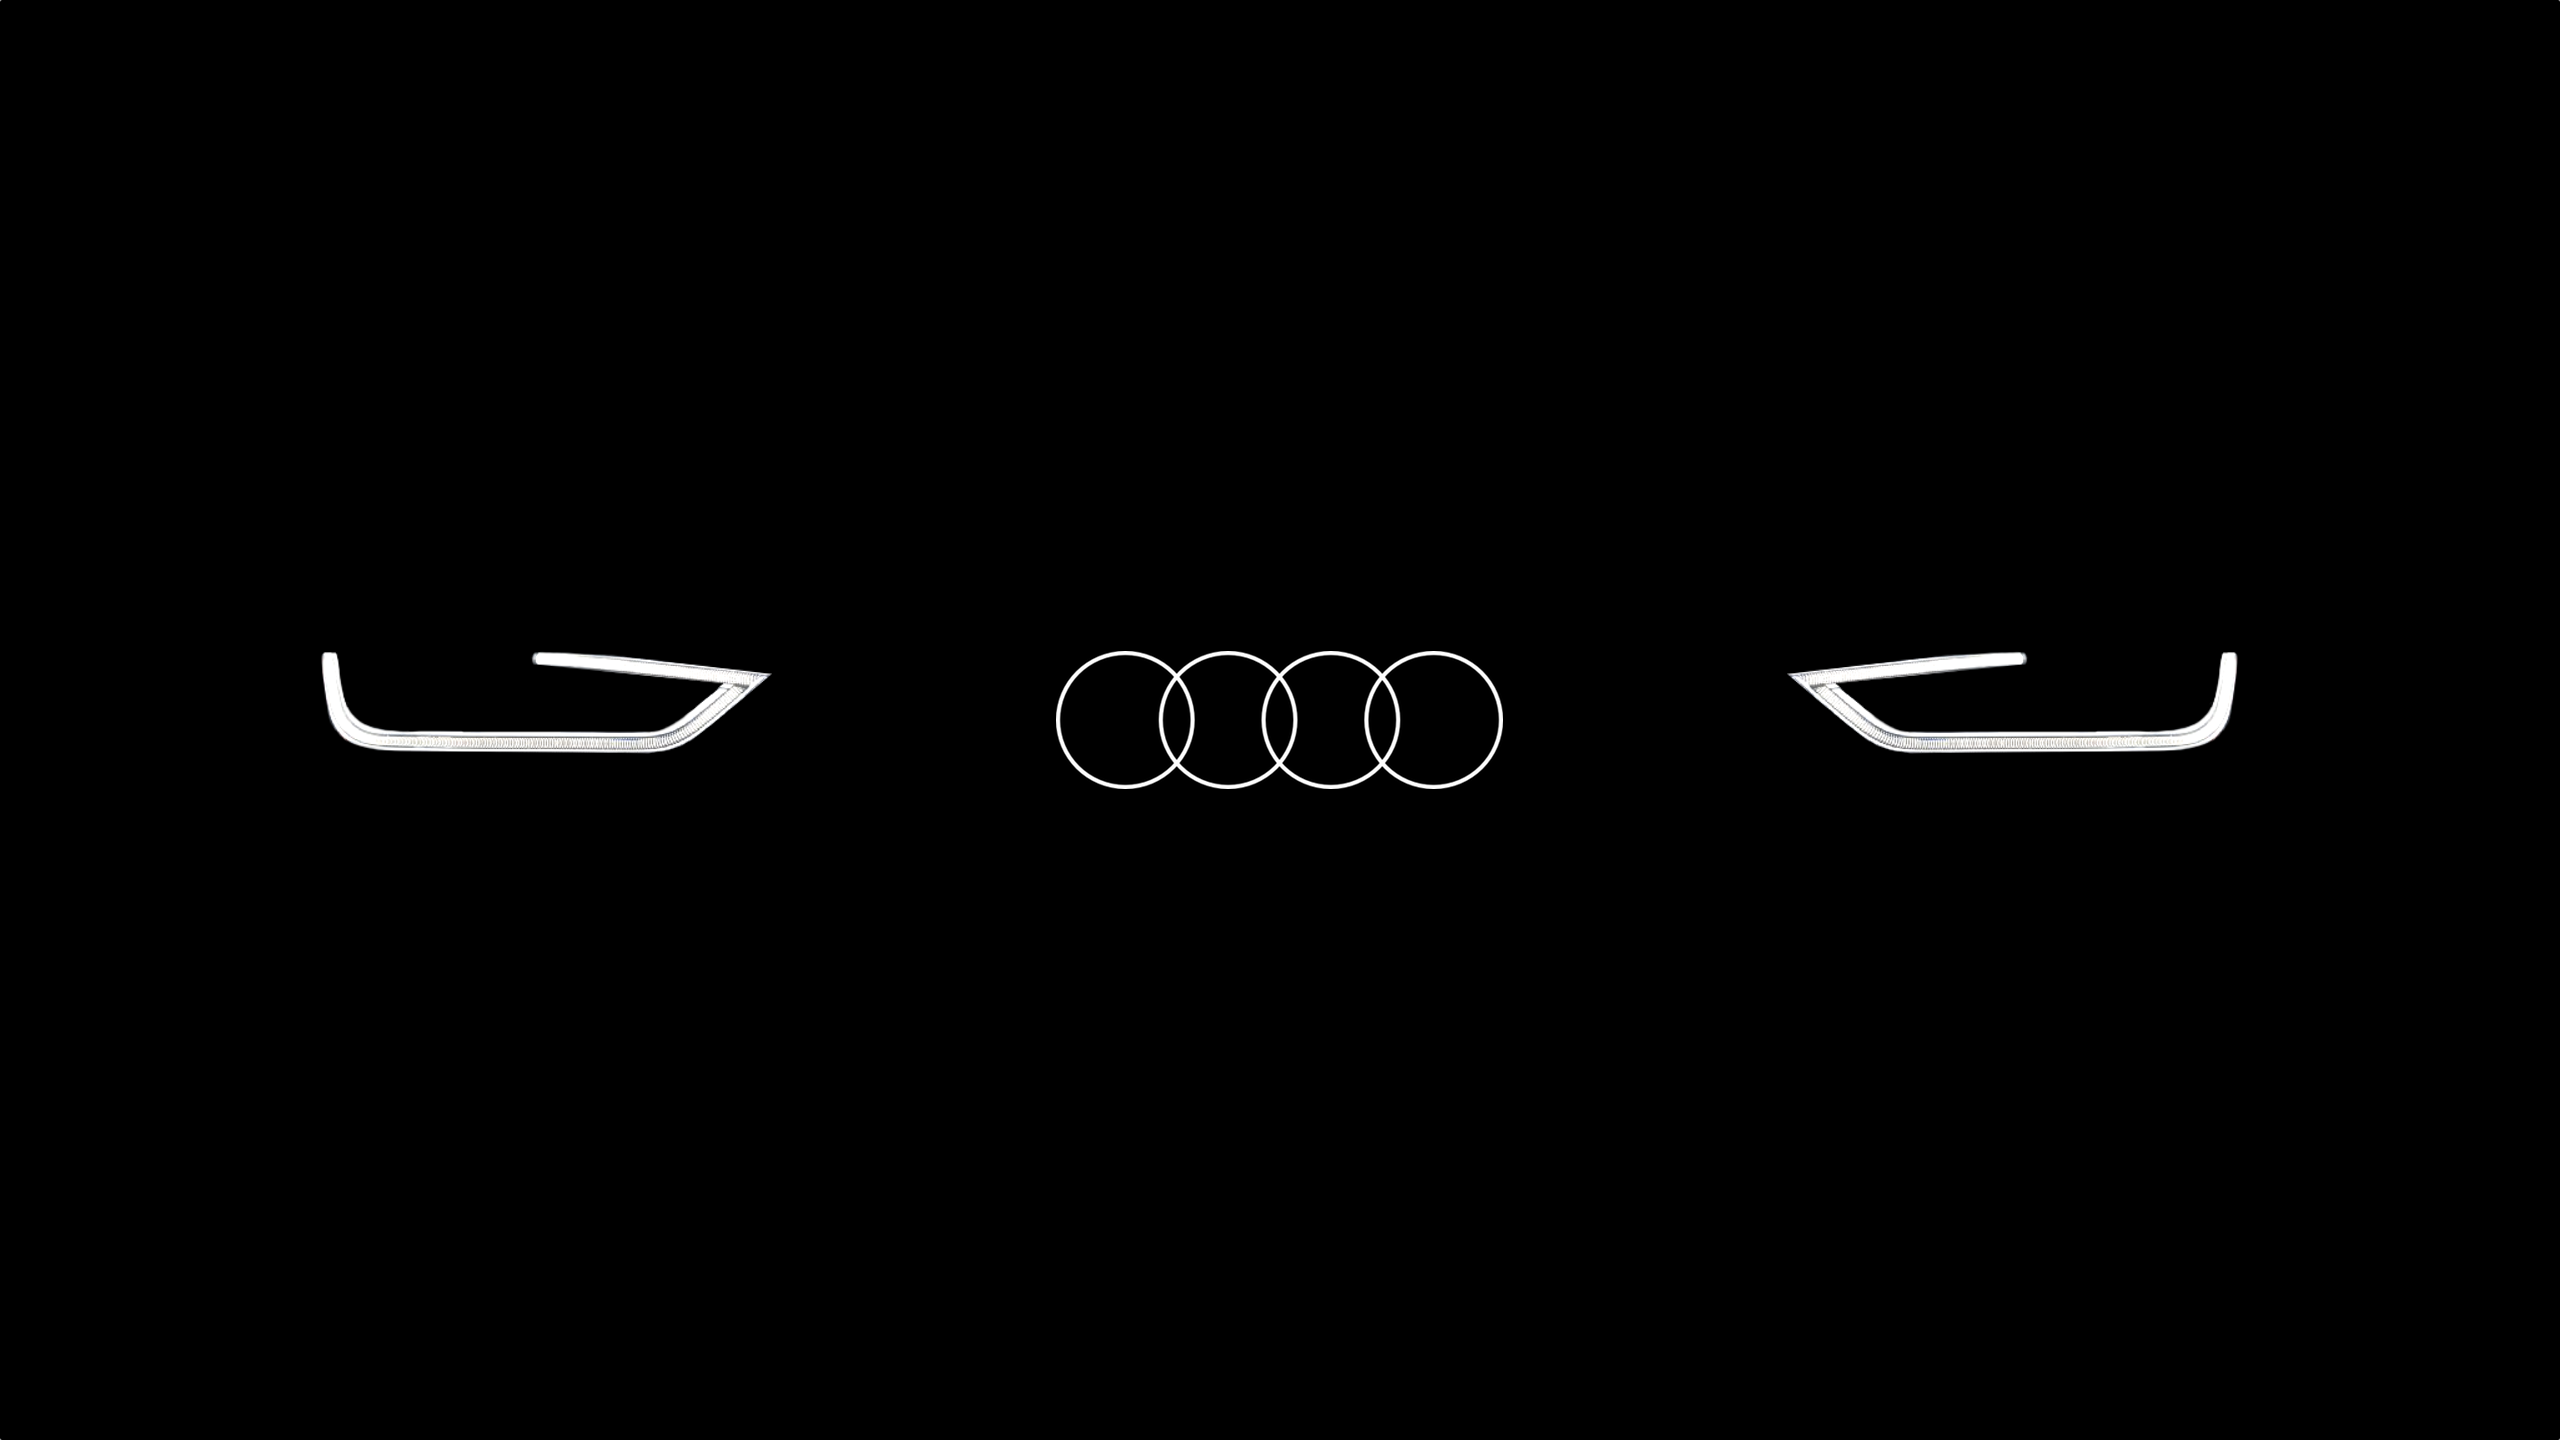 Audi Logo Photos Wallpaper 12124 2560x1440 Px 135 99 Kb